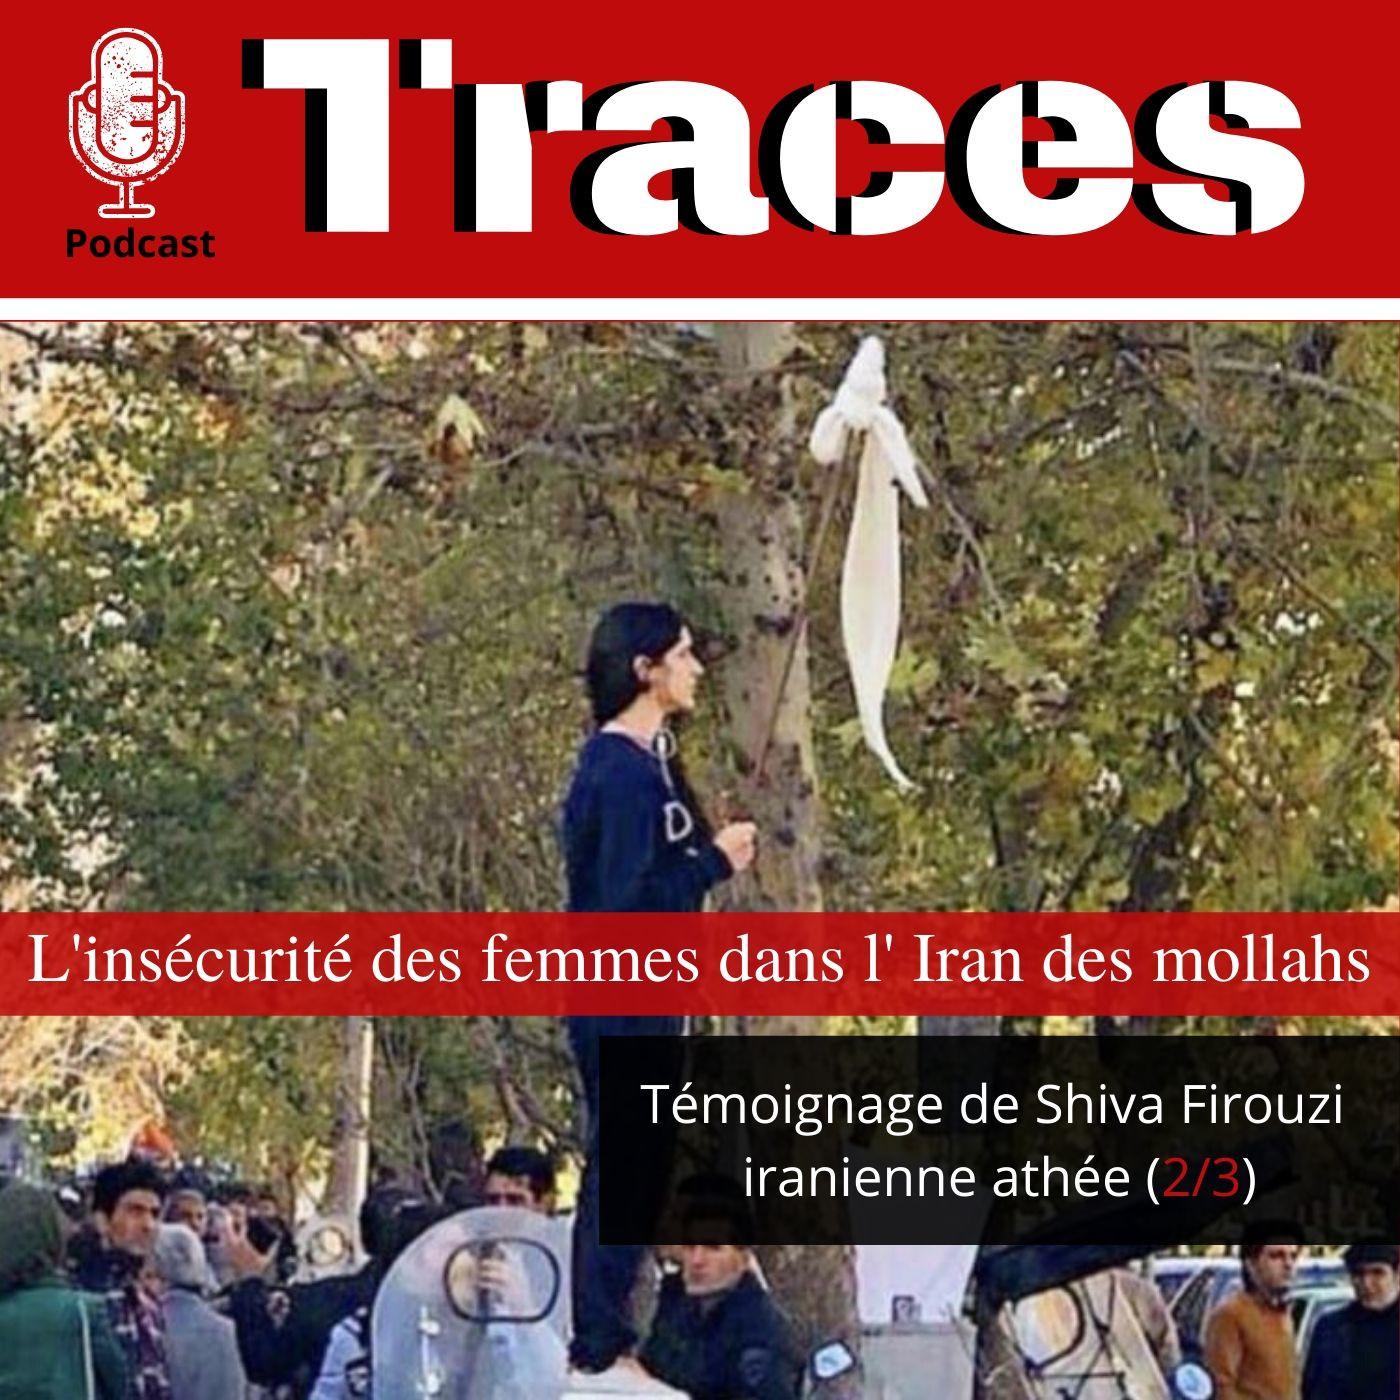 Shiva Firouzi, témoignage d'une iranienne athée (2/3)